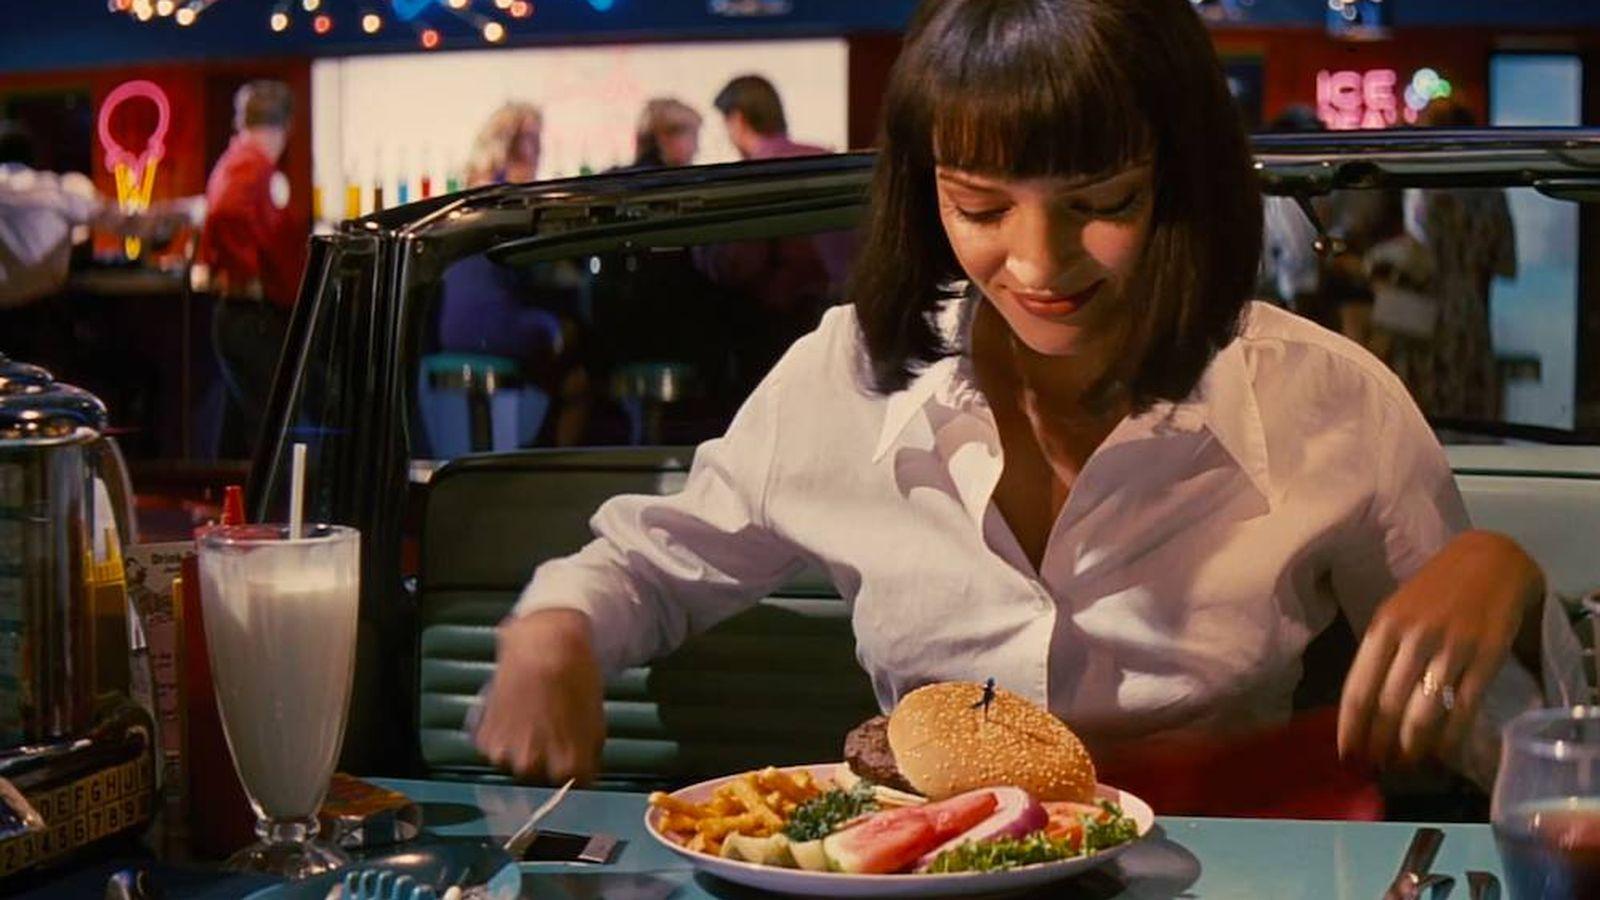 Foto: Podrás convertirte en Uma Thurman en 'Pulp Fiction'. (Miramax)